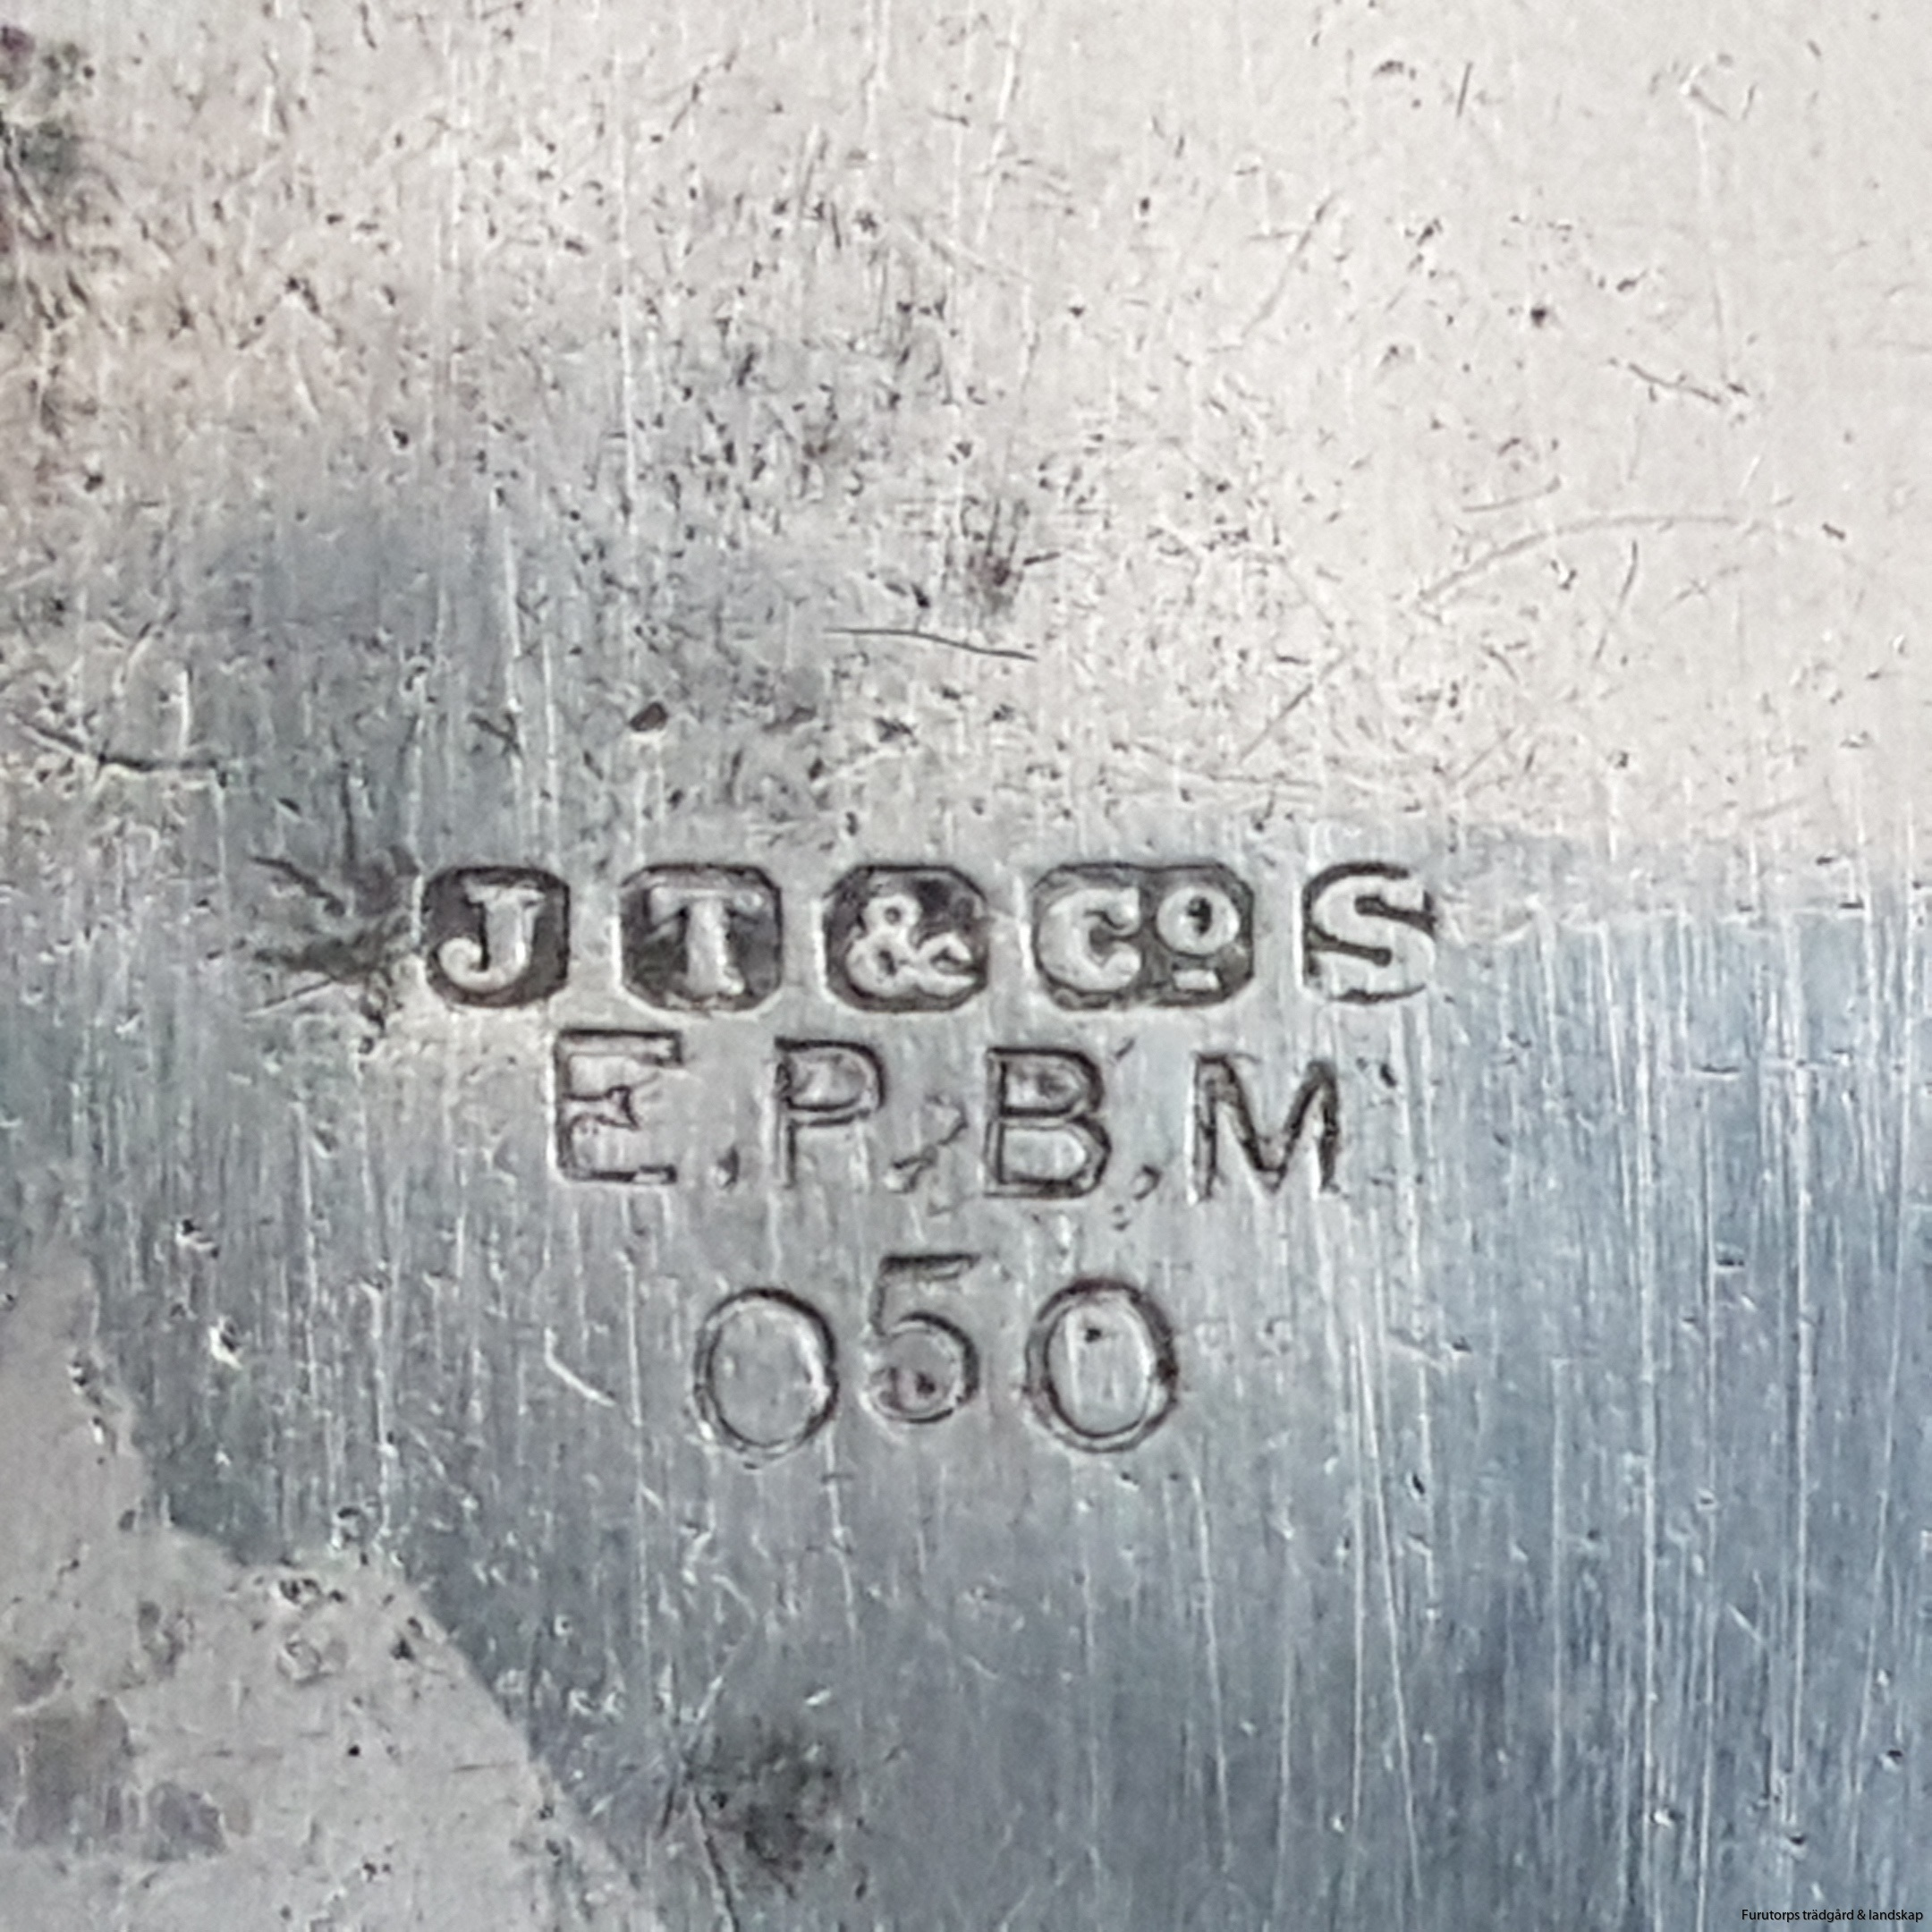 20190126_113713